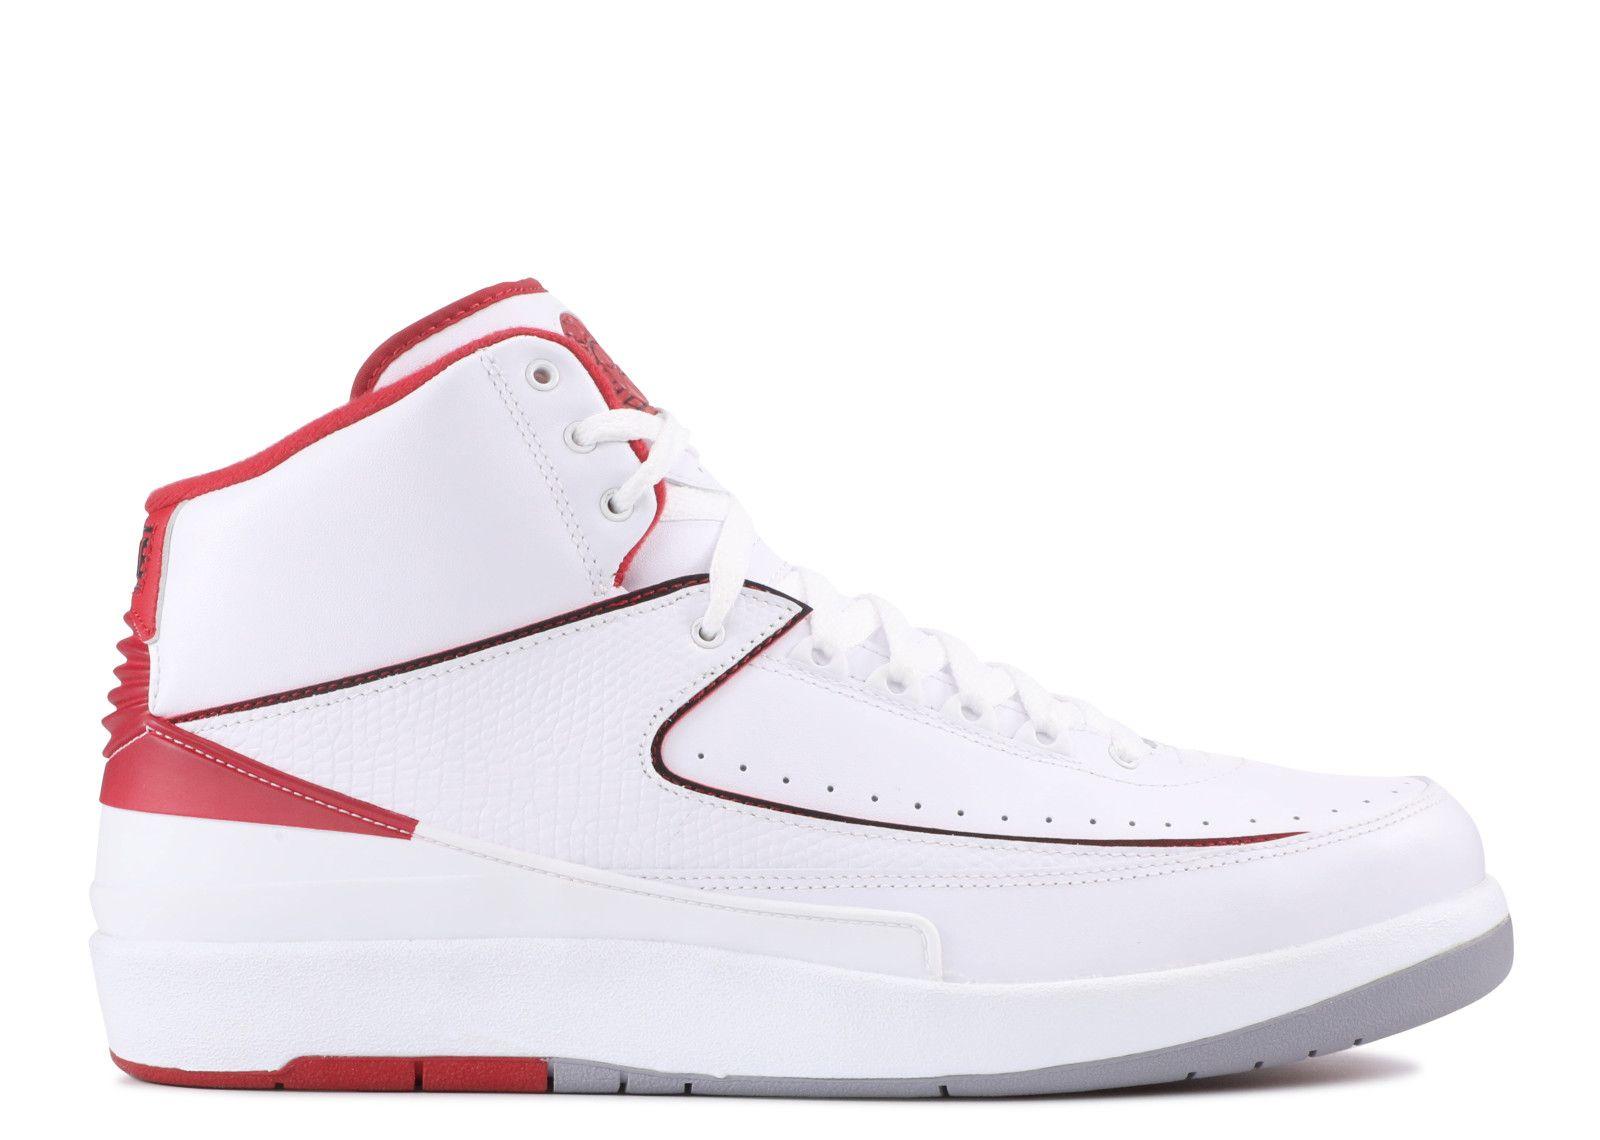 Andes combinar fusible  Air Jordan 2 Retro 'Chicago Home' - Air Jordan - 385475 102 -  white/black-vrsty red-cmnt gry | Air jordans, Nike air shoes, Jordans